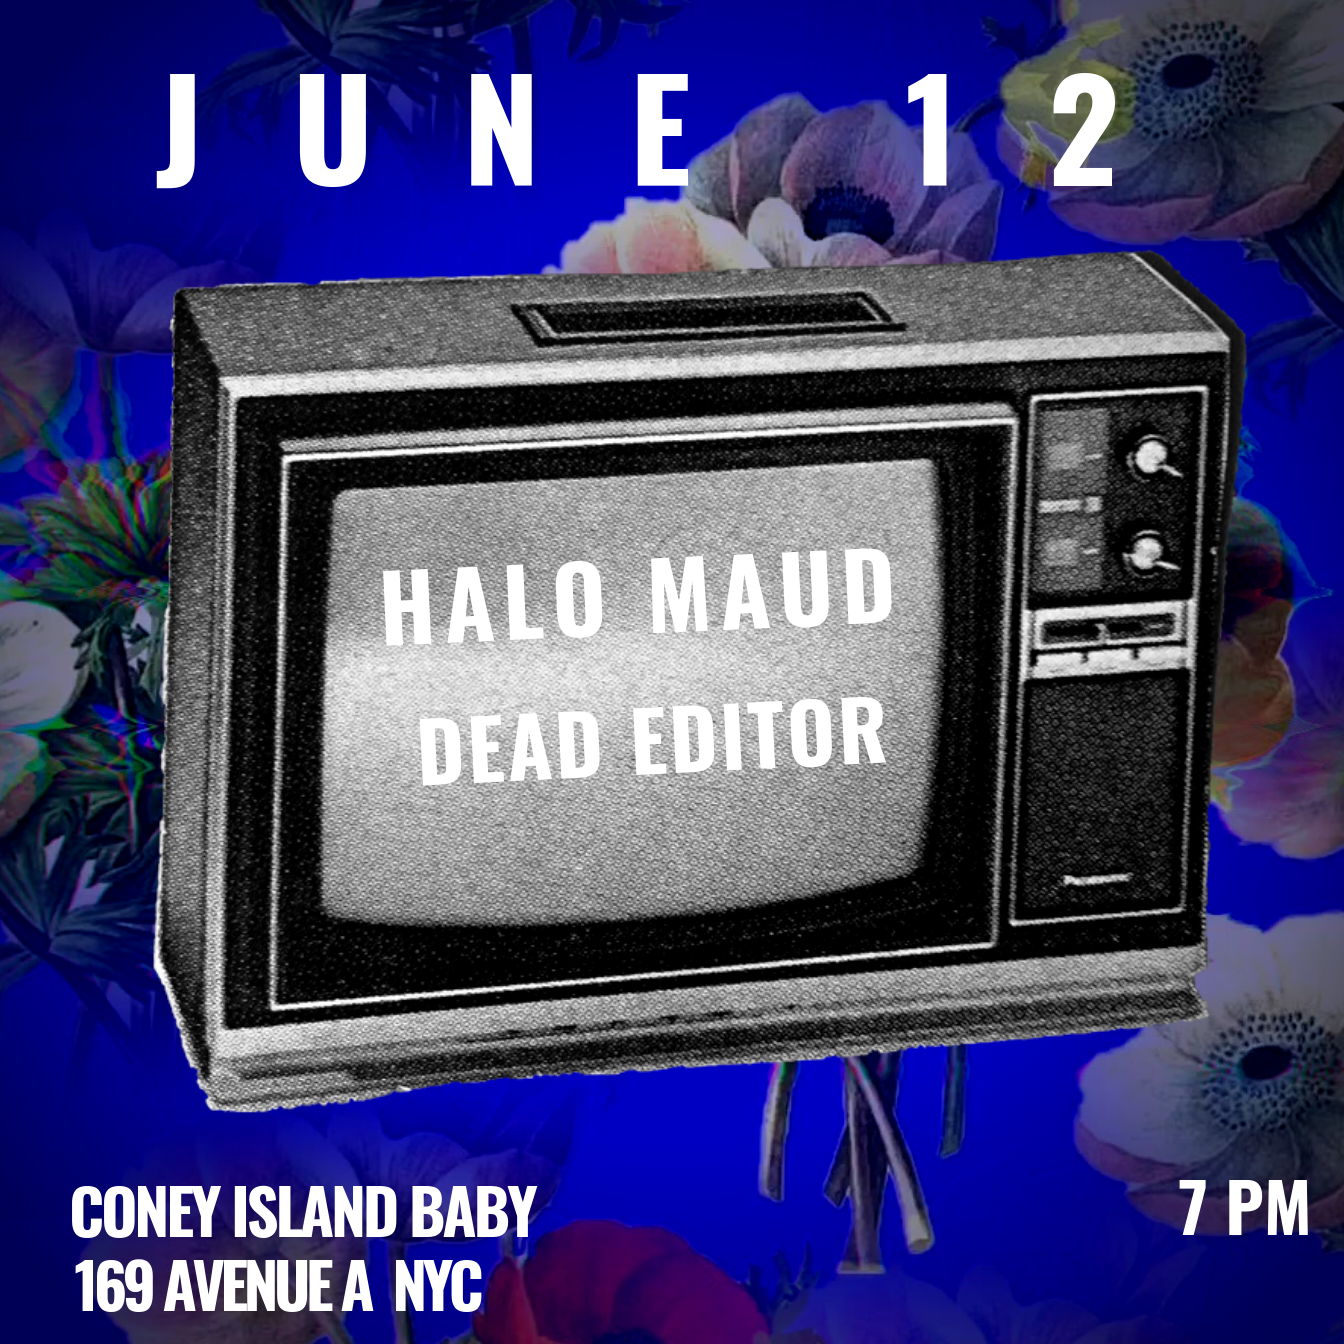 dead editor halo maud coney island baby.png